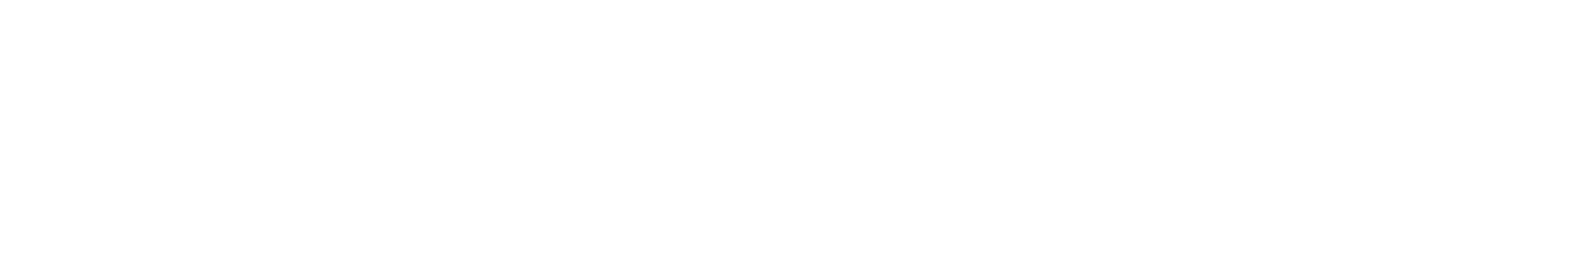 venkatnagaram full stack developer freelance web designer in hyderabad web development professional software development